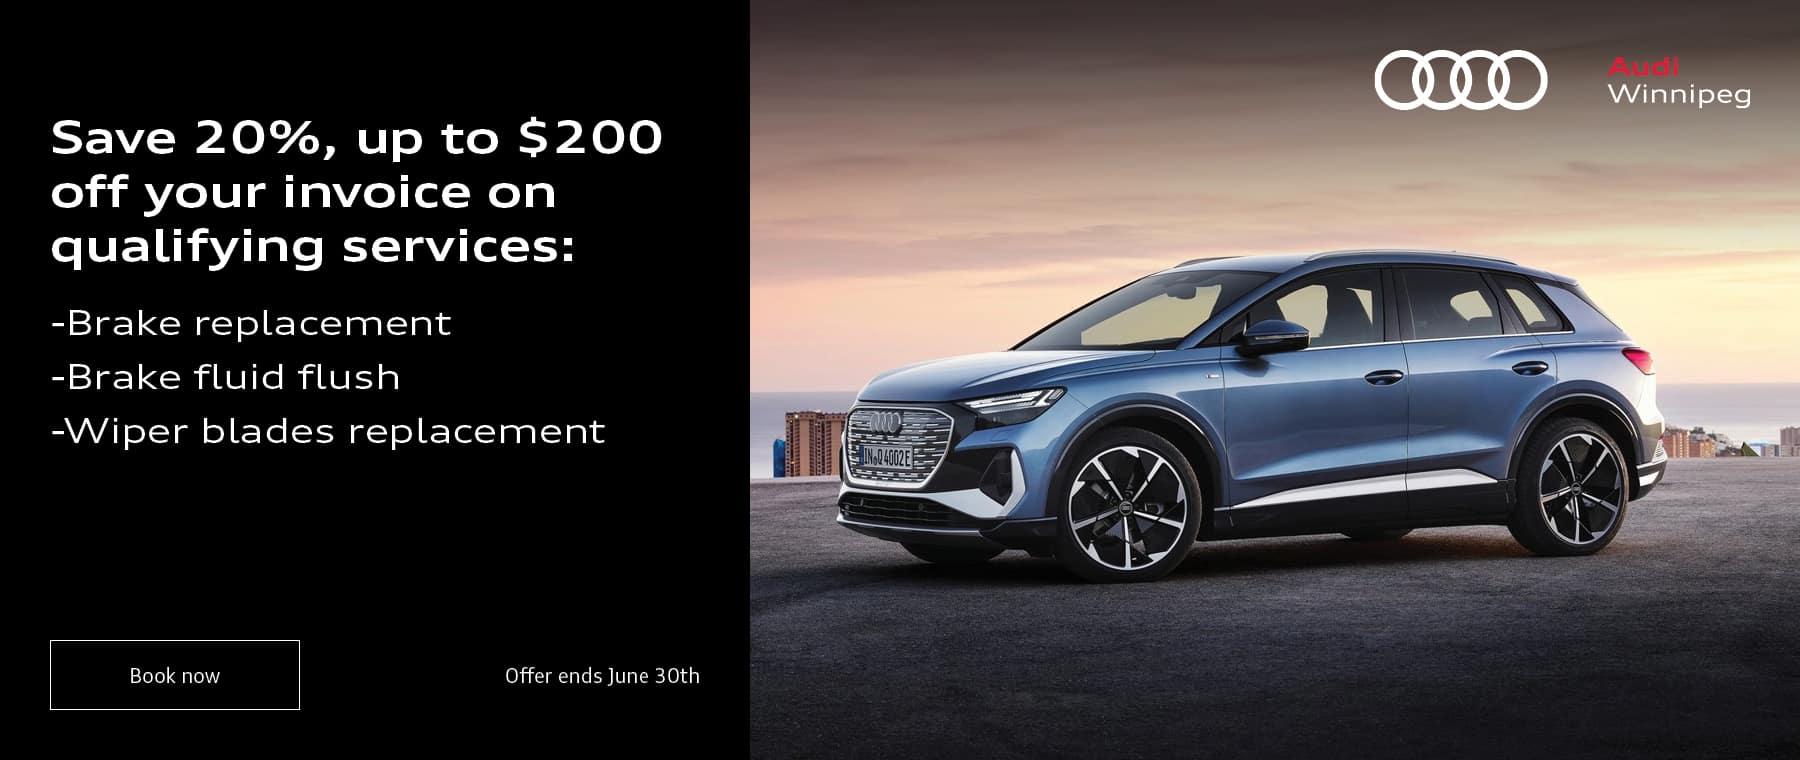 Audi-Wpg-June-Service-Promo – Web-Banner